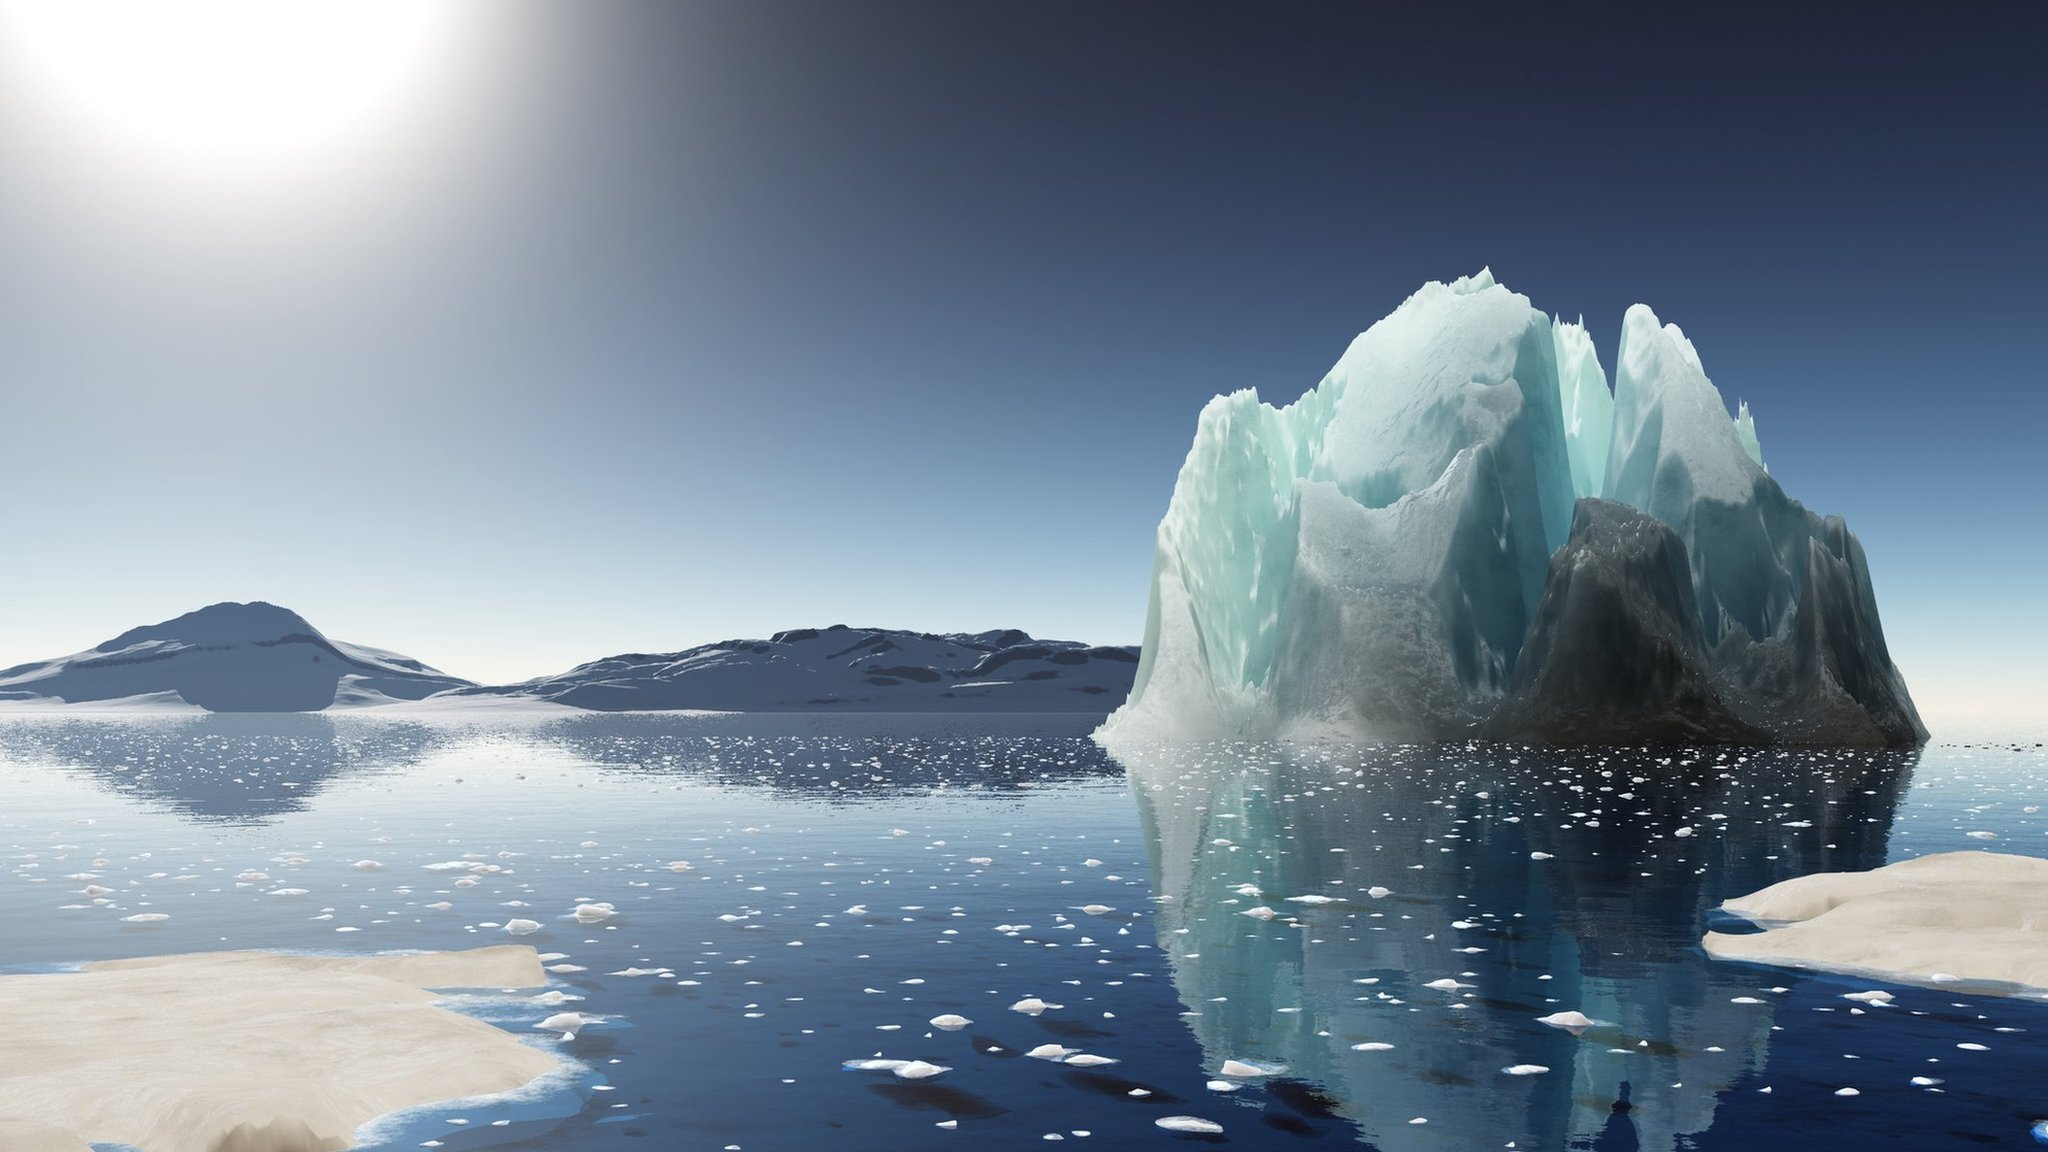 Global warming: Melting Antarctic sea ice at record low - CBBC Newsround